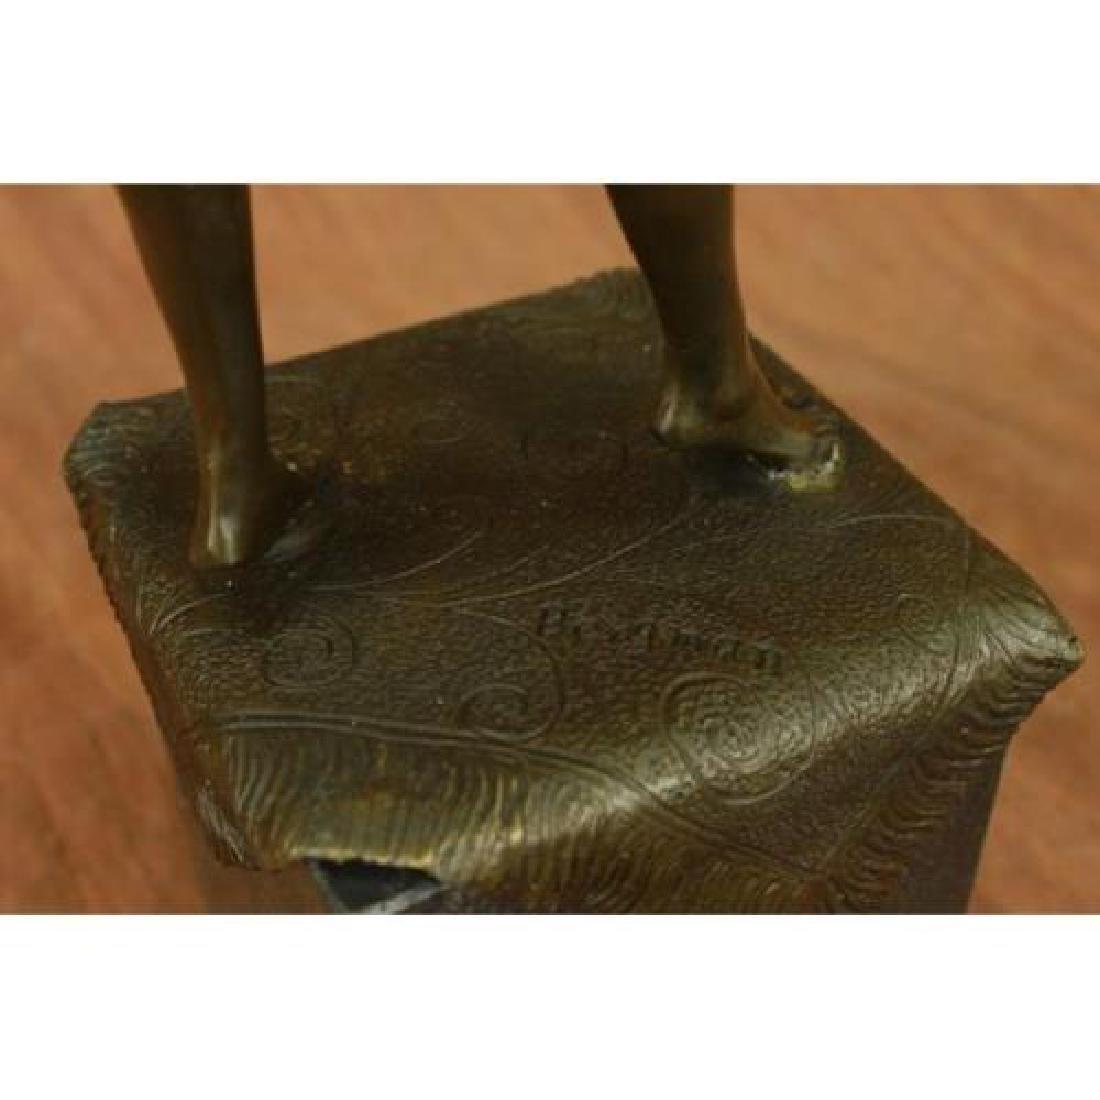 Arabian Girl With Lifting Skirt on Rug Bronze Sculpture - 6